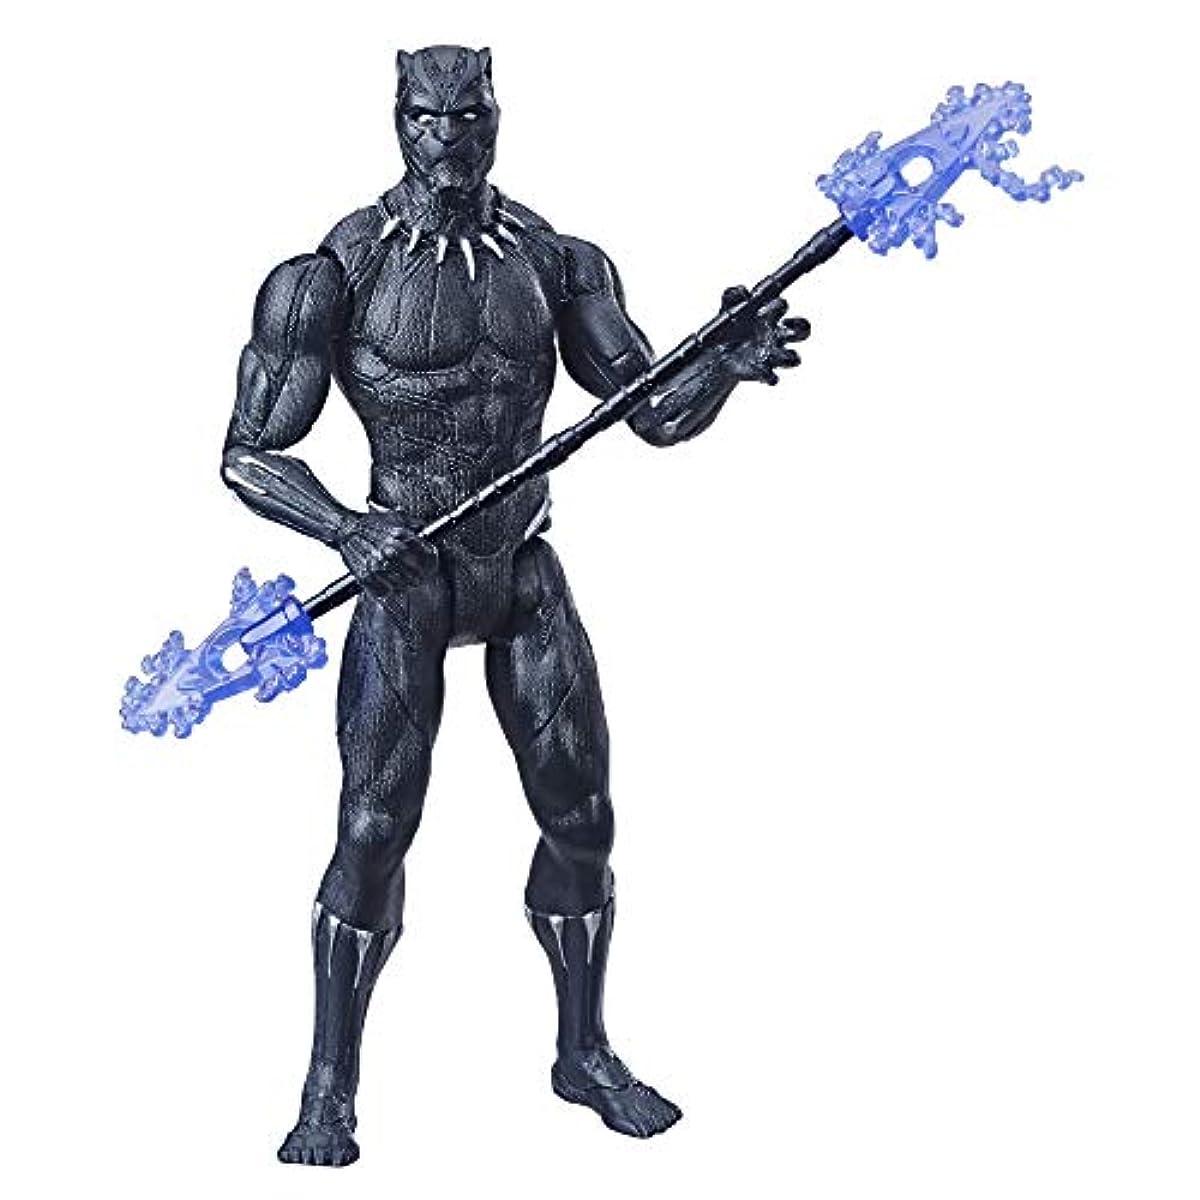 Marvel Avengers Black Panther 15-Cm-Scale Marvel Superhero Action Figure Toy